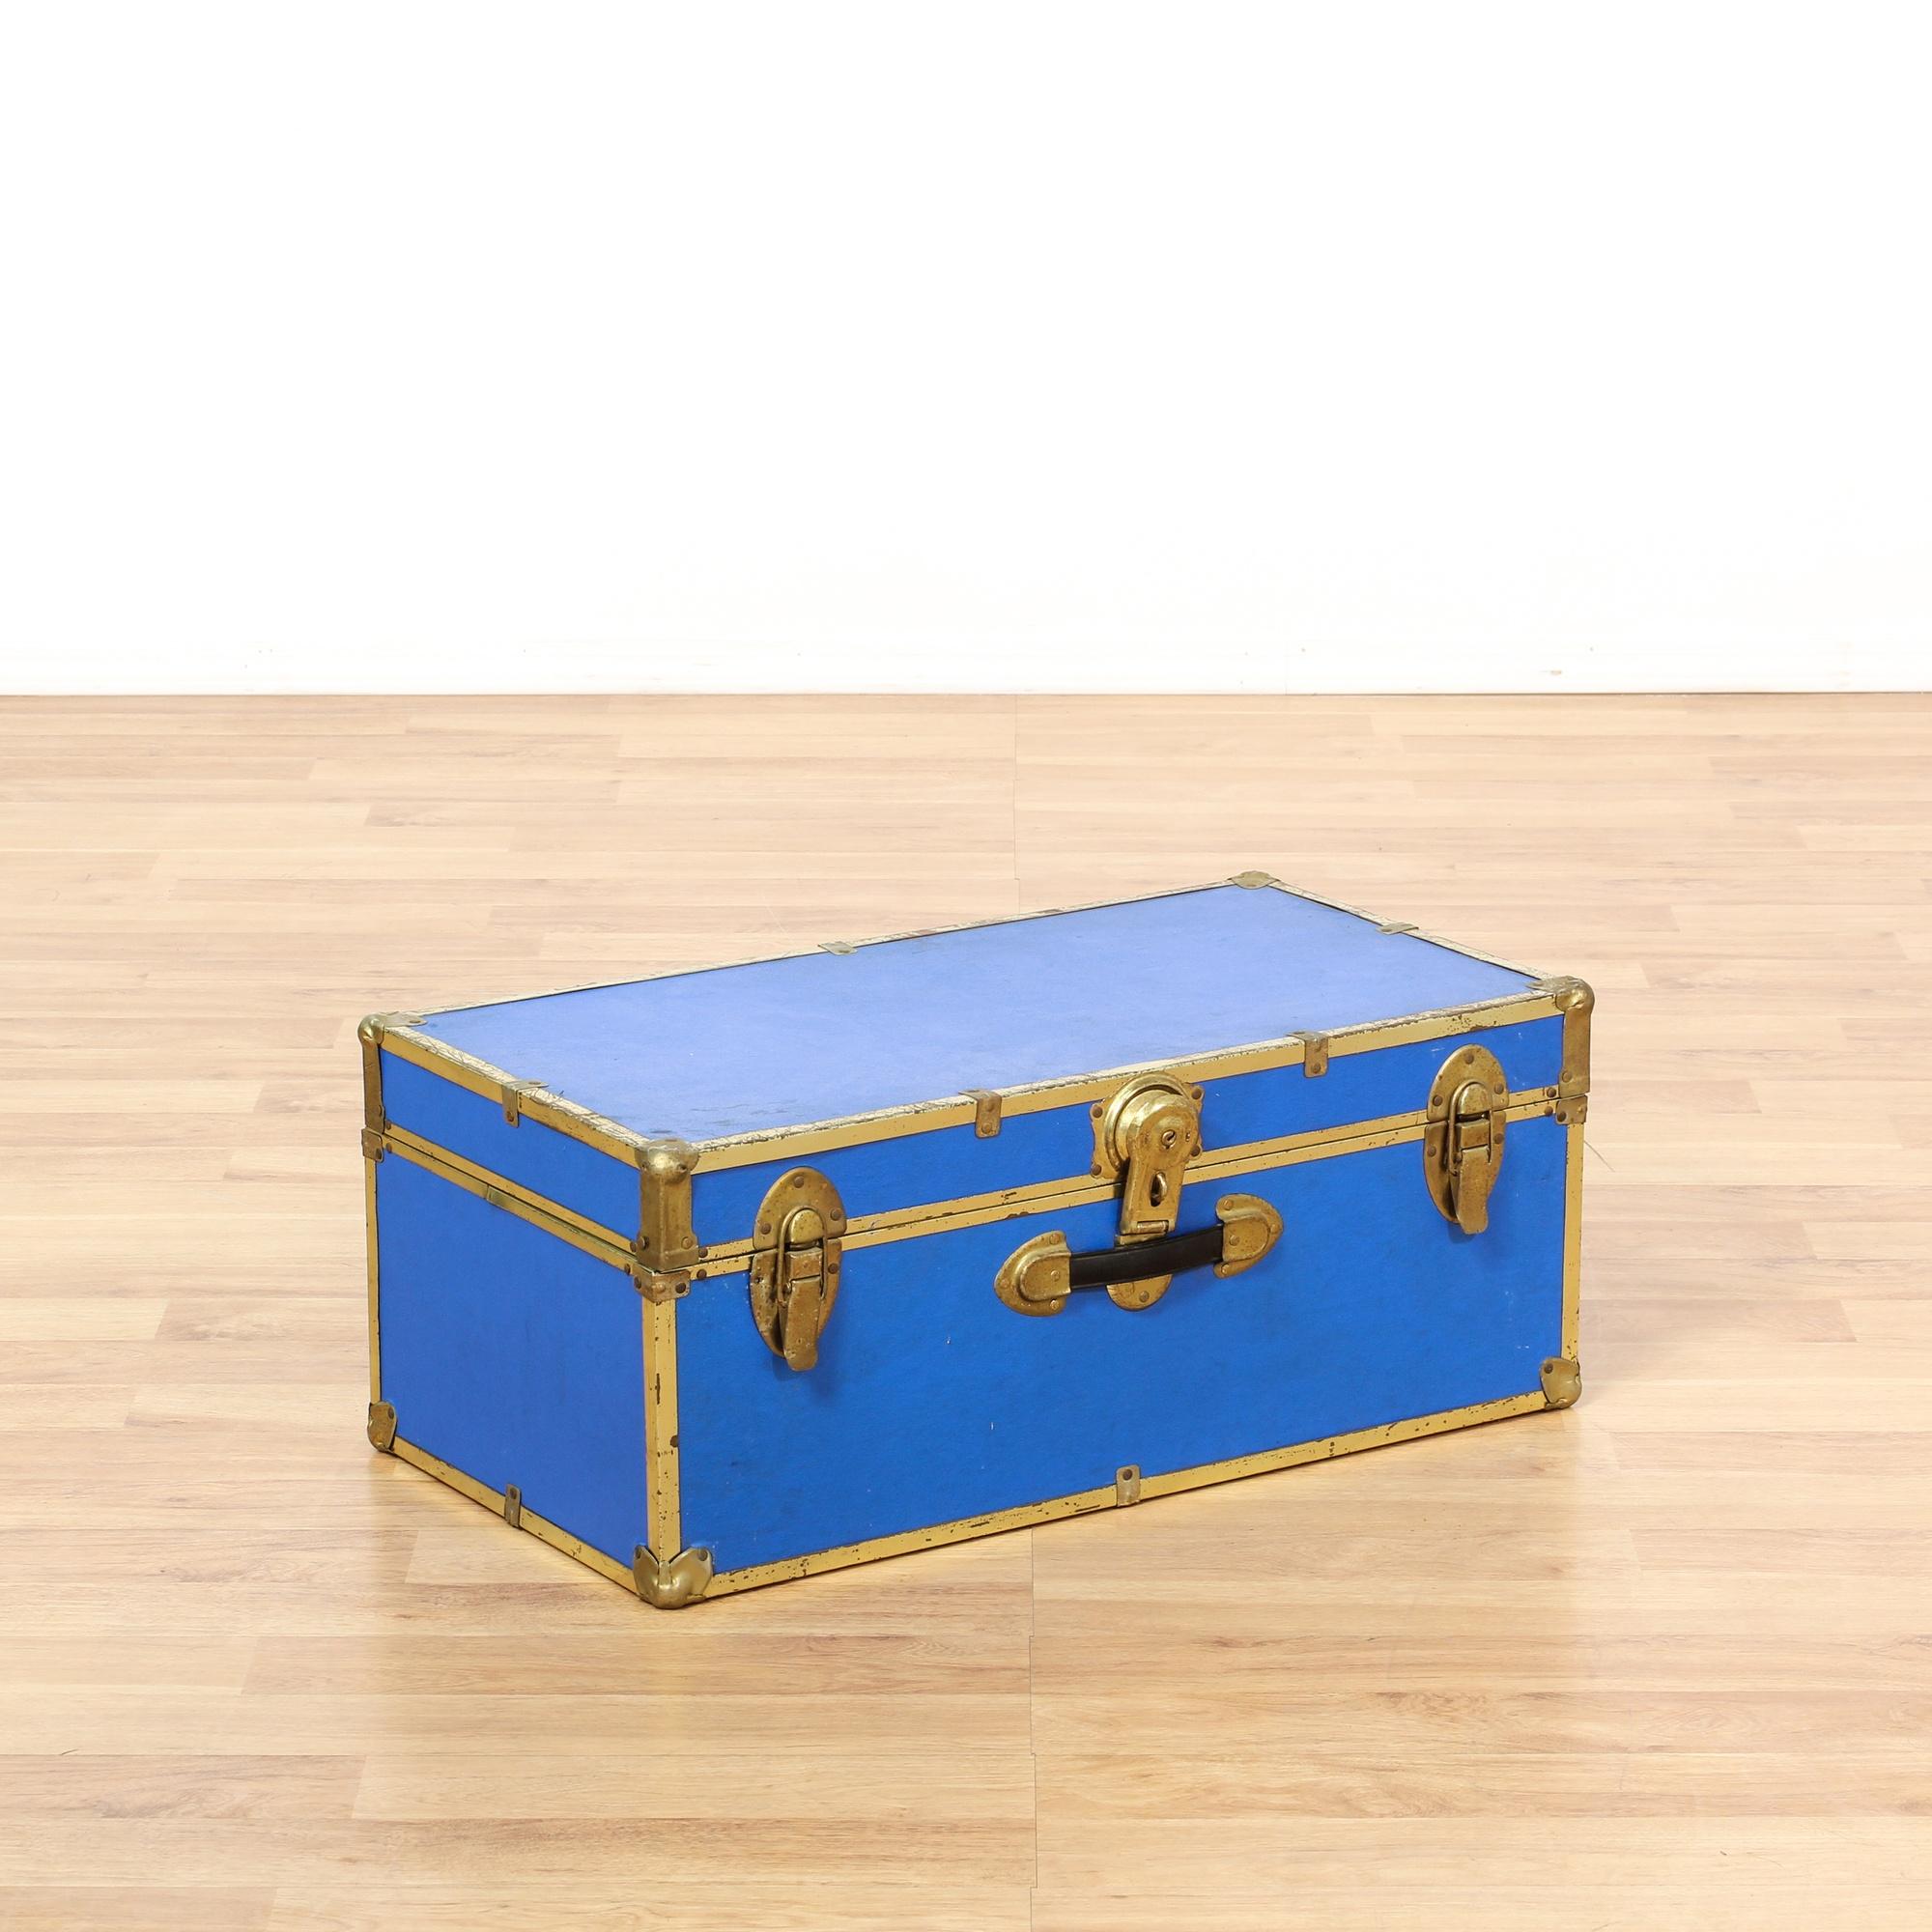 Kaplan Global Trunk Coffee Table Reclaimed Whitewash Large: Vibrant Blue & Brass Trunk